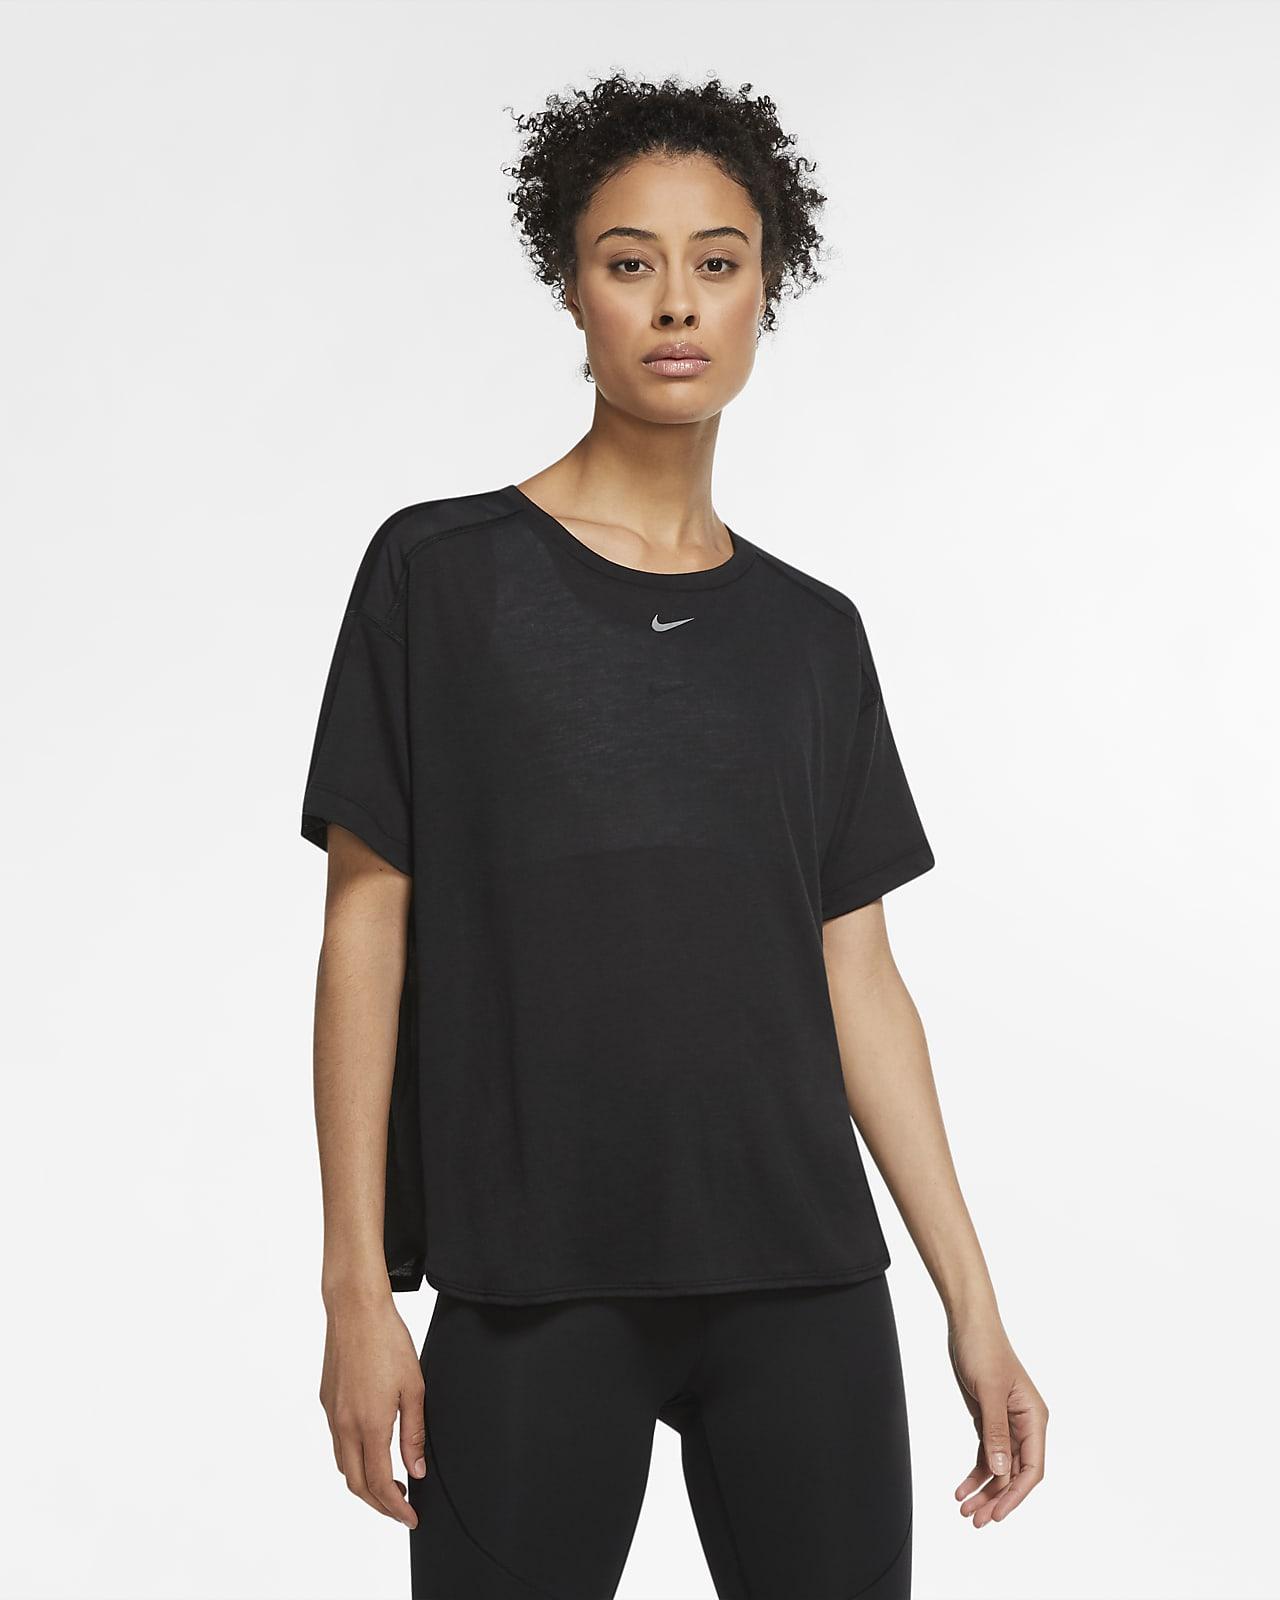 Damska koszulka z krótkim rękawem Nike Pro AeroAdapt